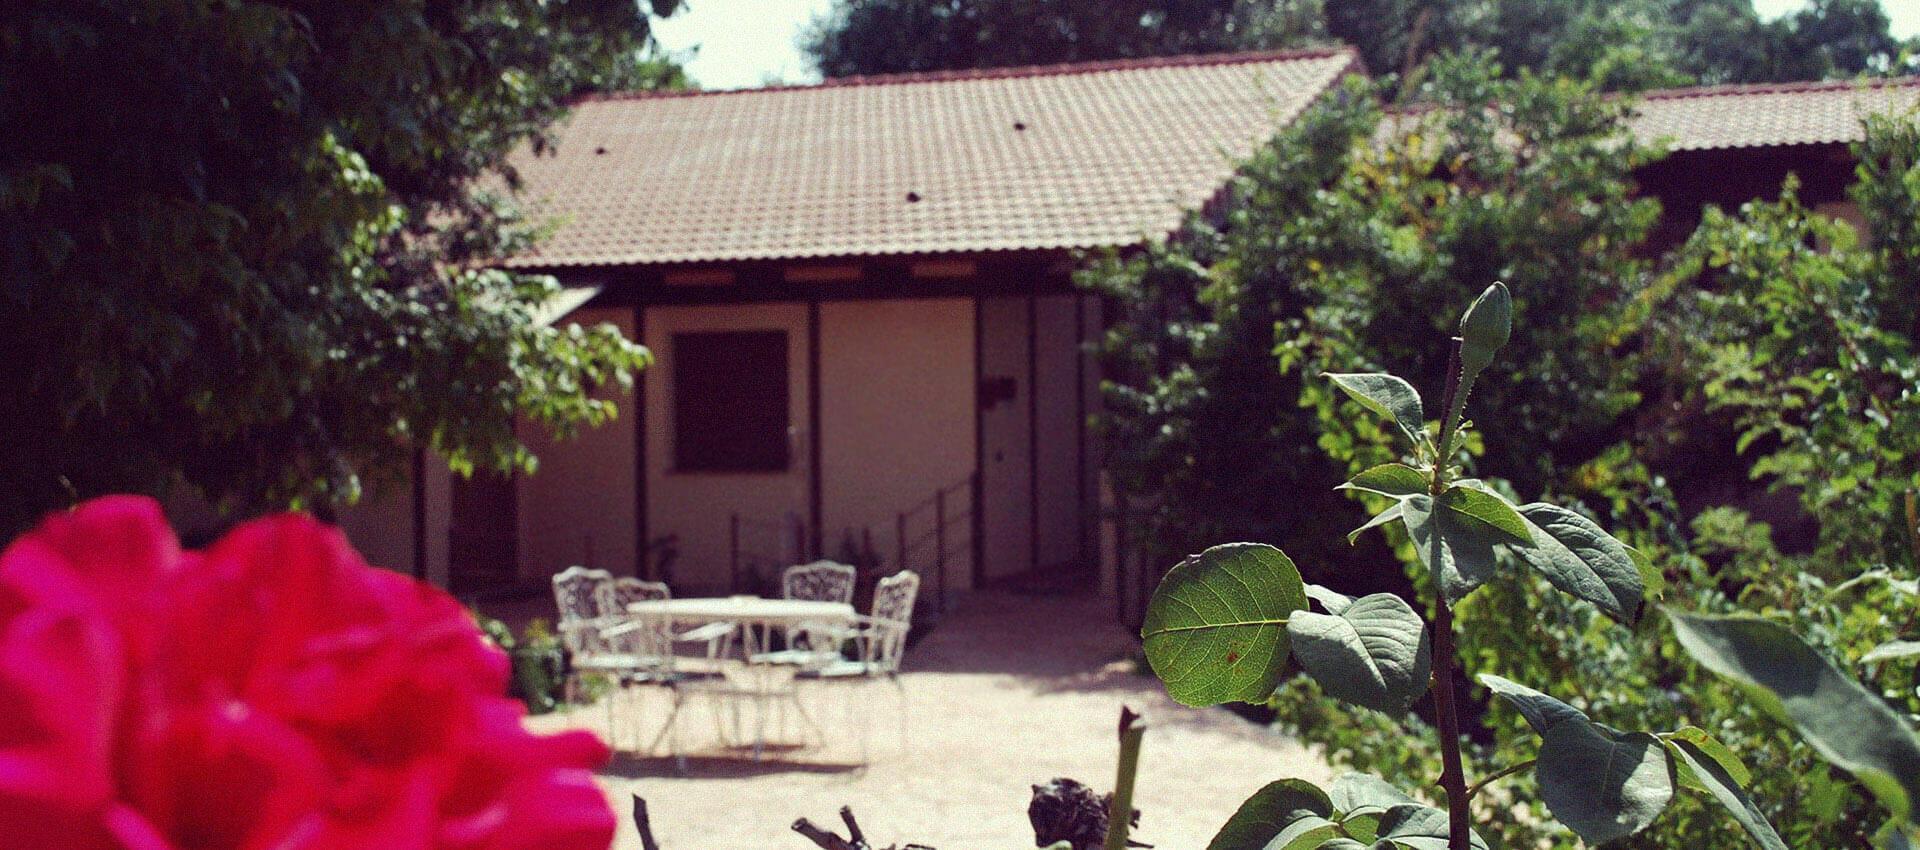 Hotel Rural en Tharsys